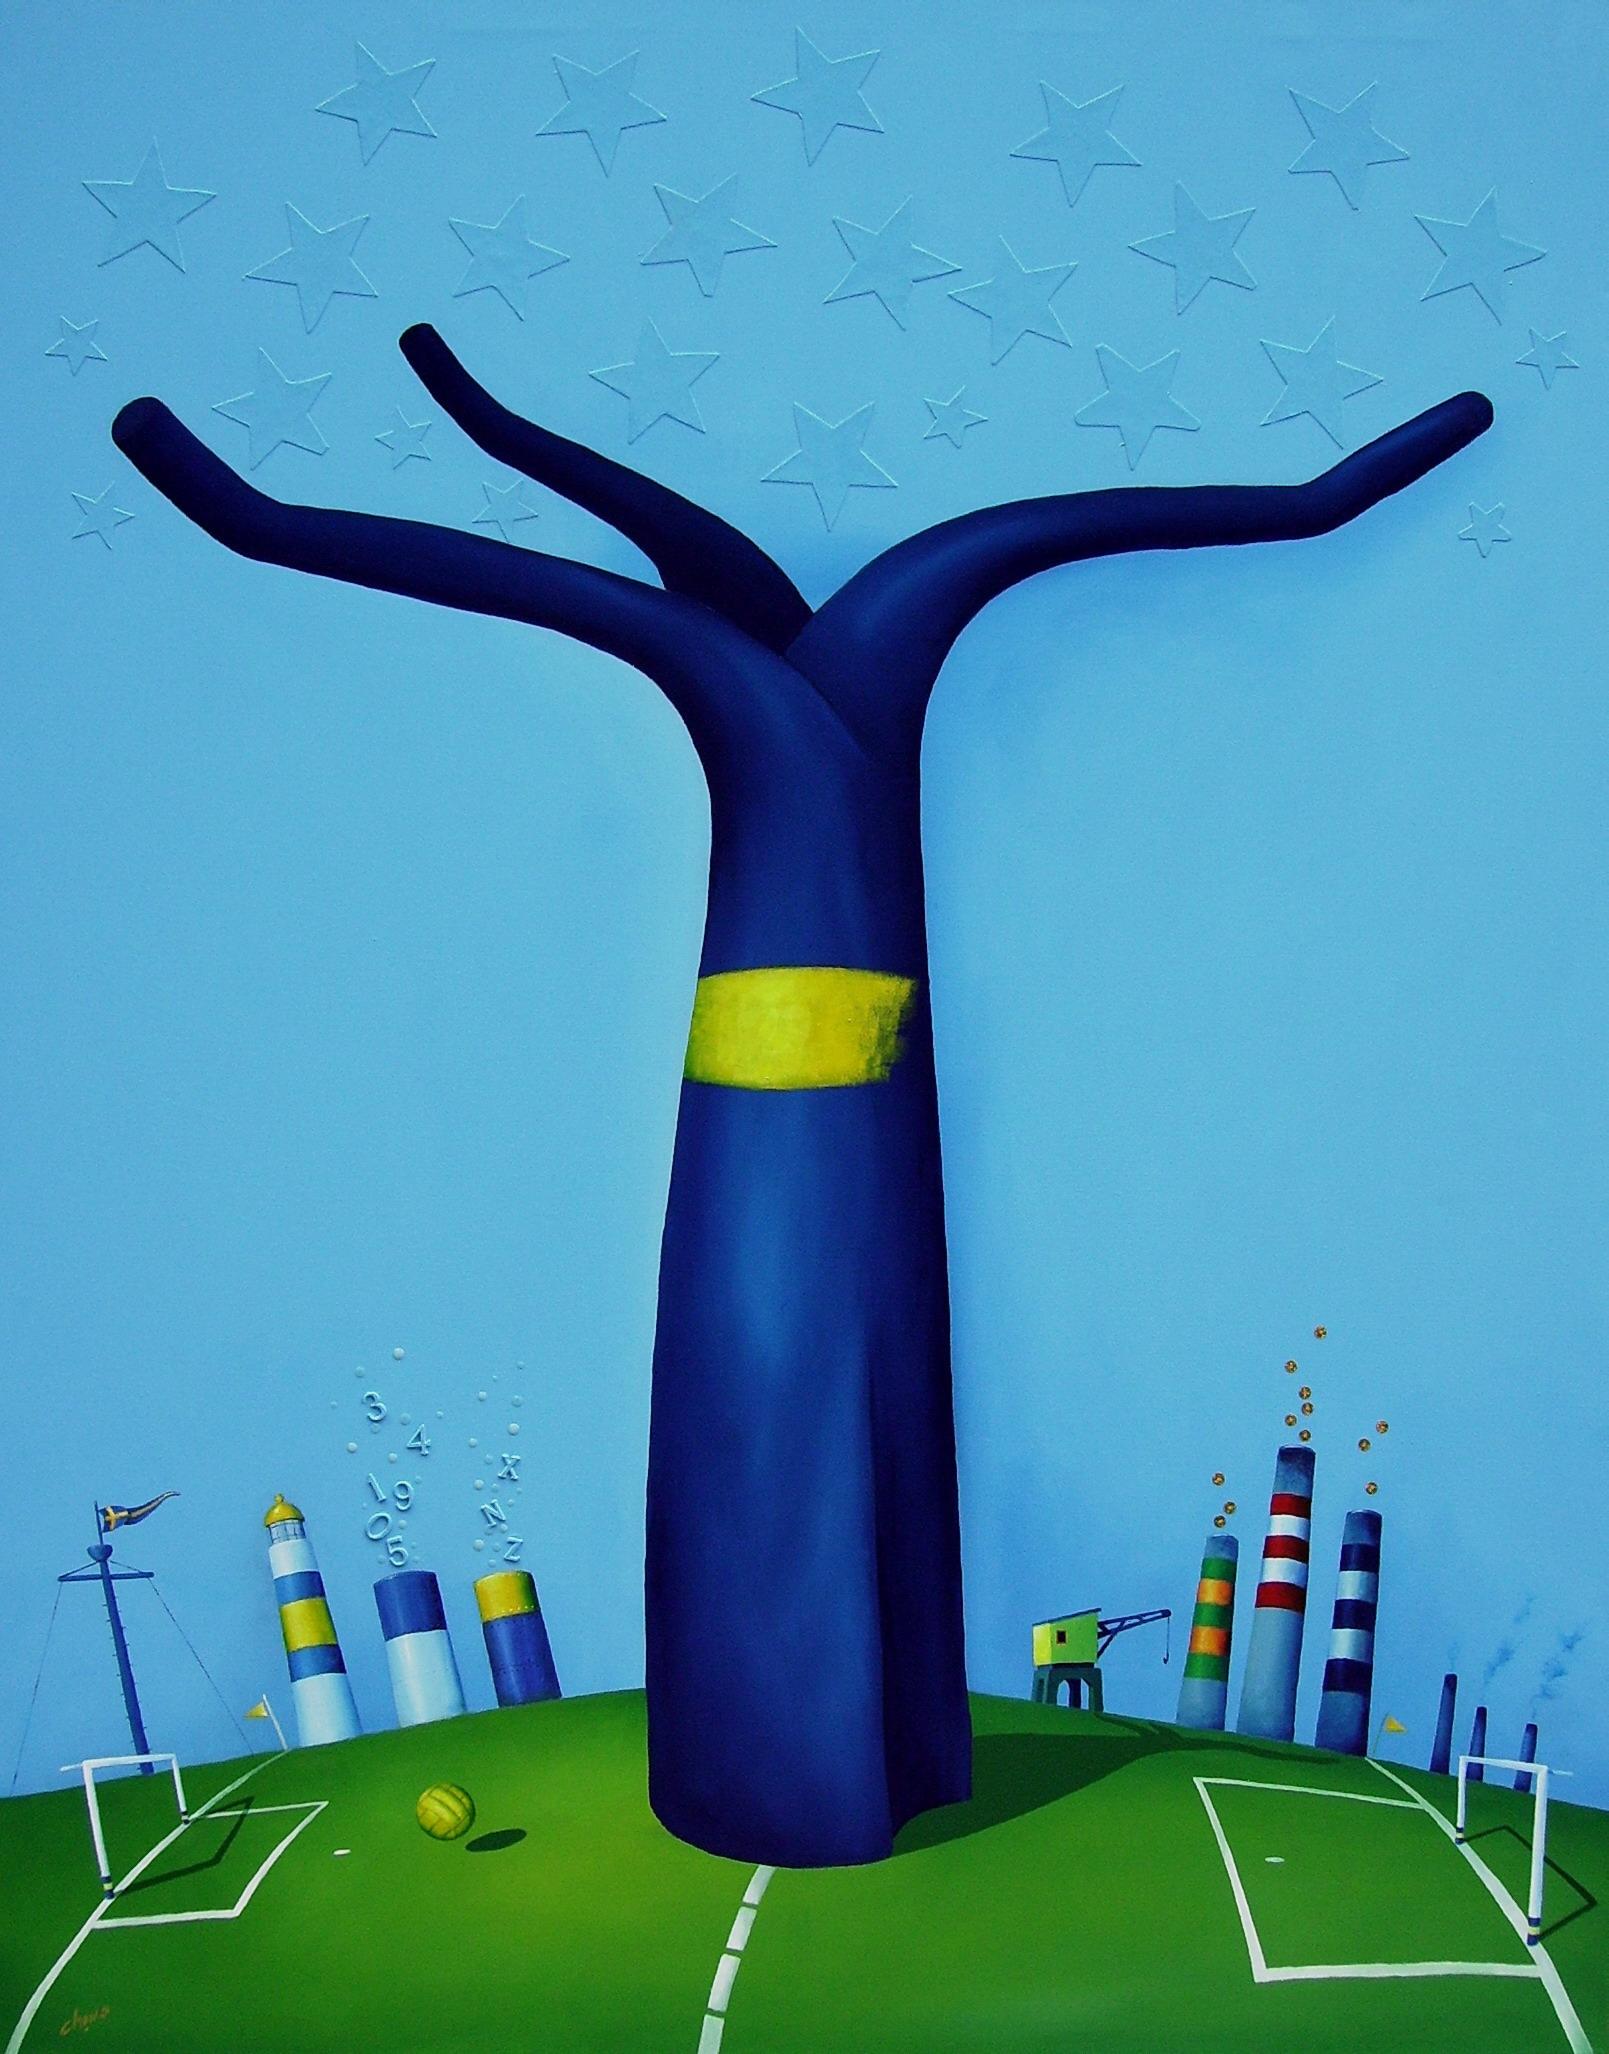 Árbol Xeneize- Técnica mixta sobre tela- 150 x 120 cm.